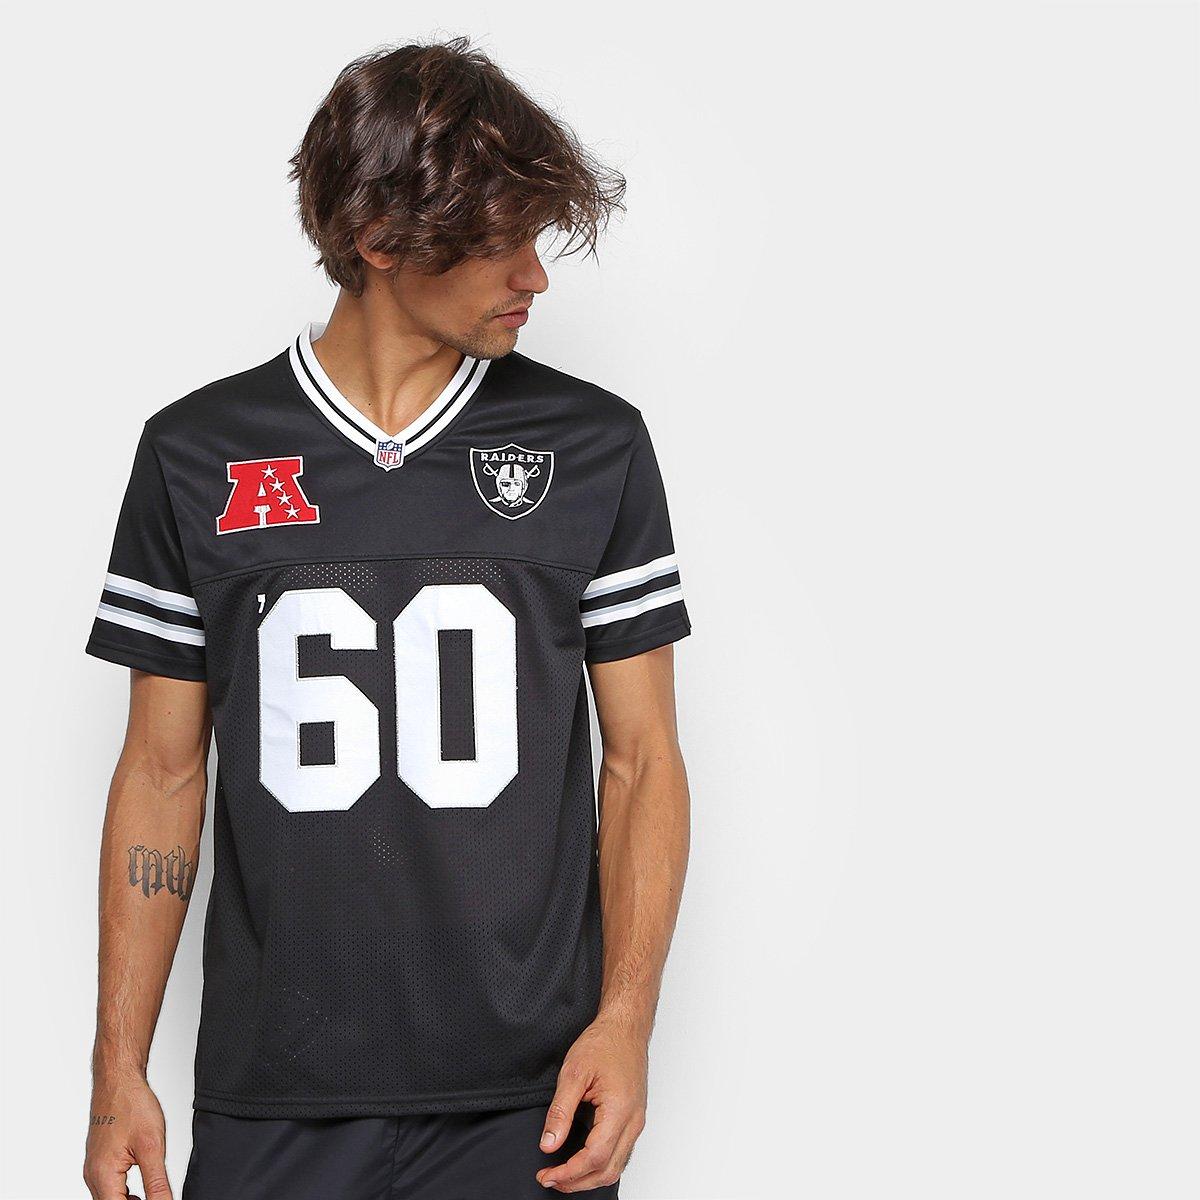 Camiseta New Era NFL Sports Vein Oakland Raider Masculina - Compre ... c0b5bdc0b5e43